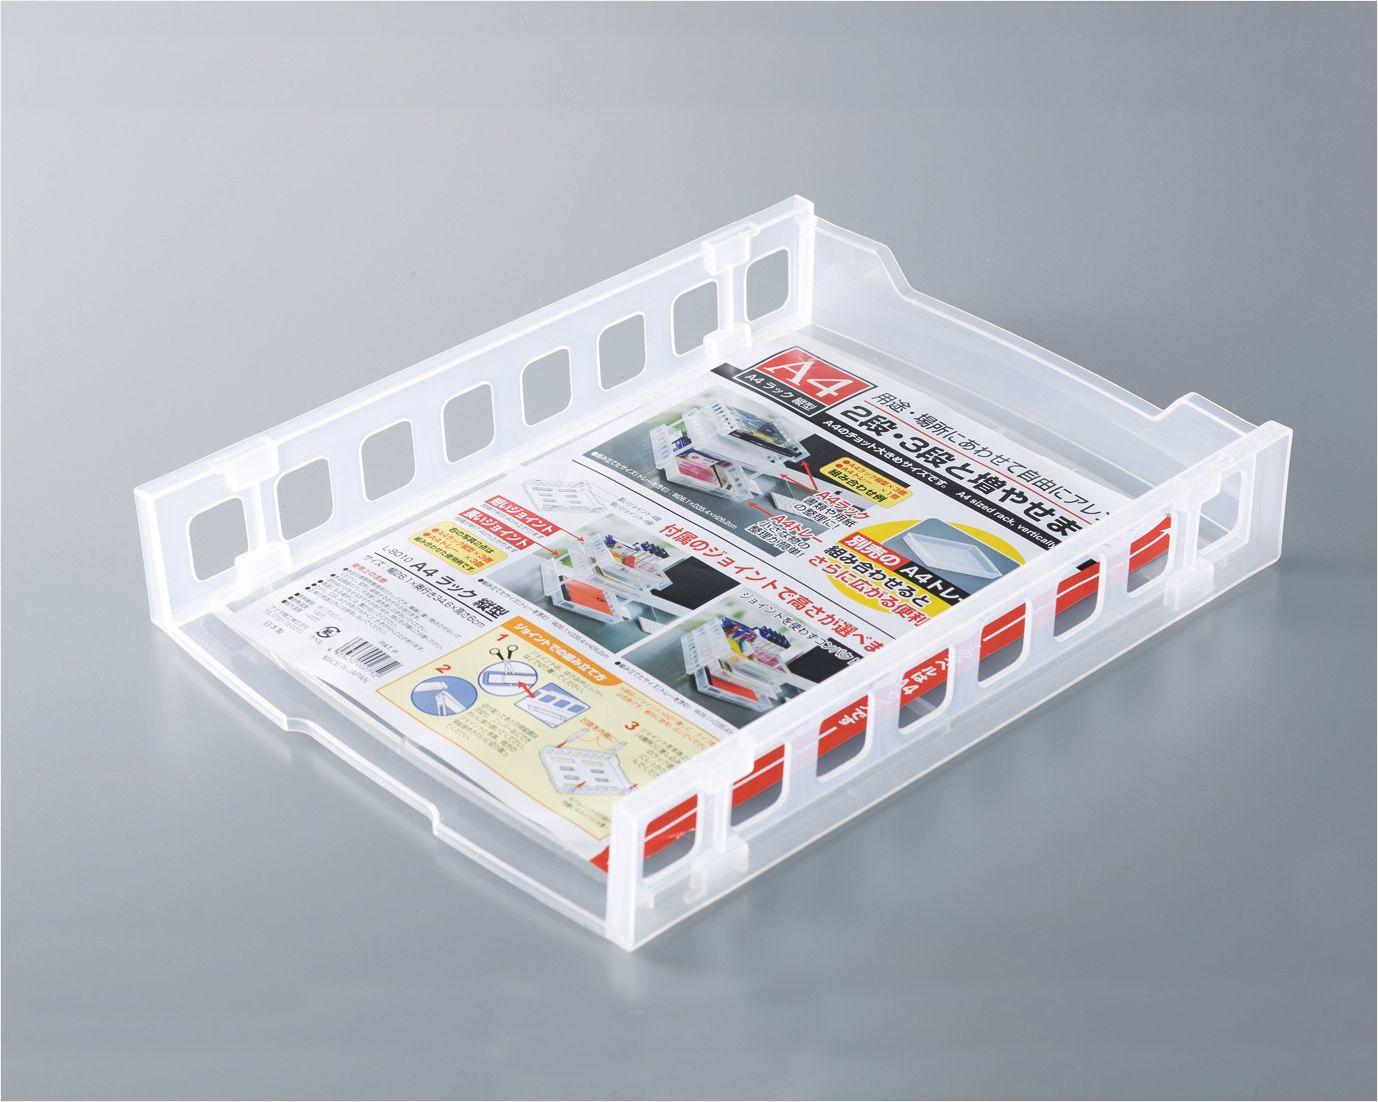 sanada日本纵向A4纸收纳盒